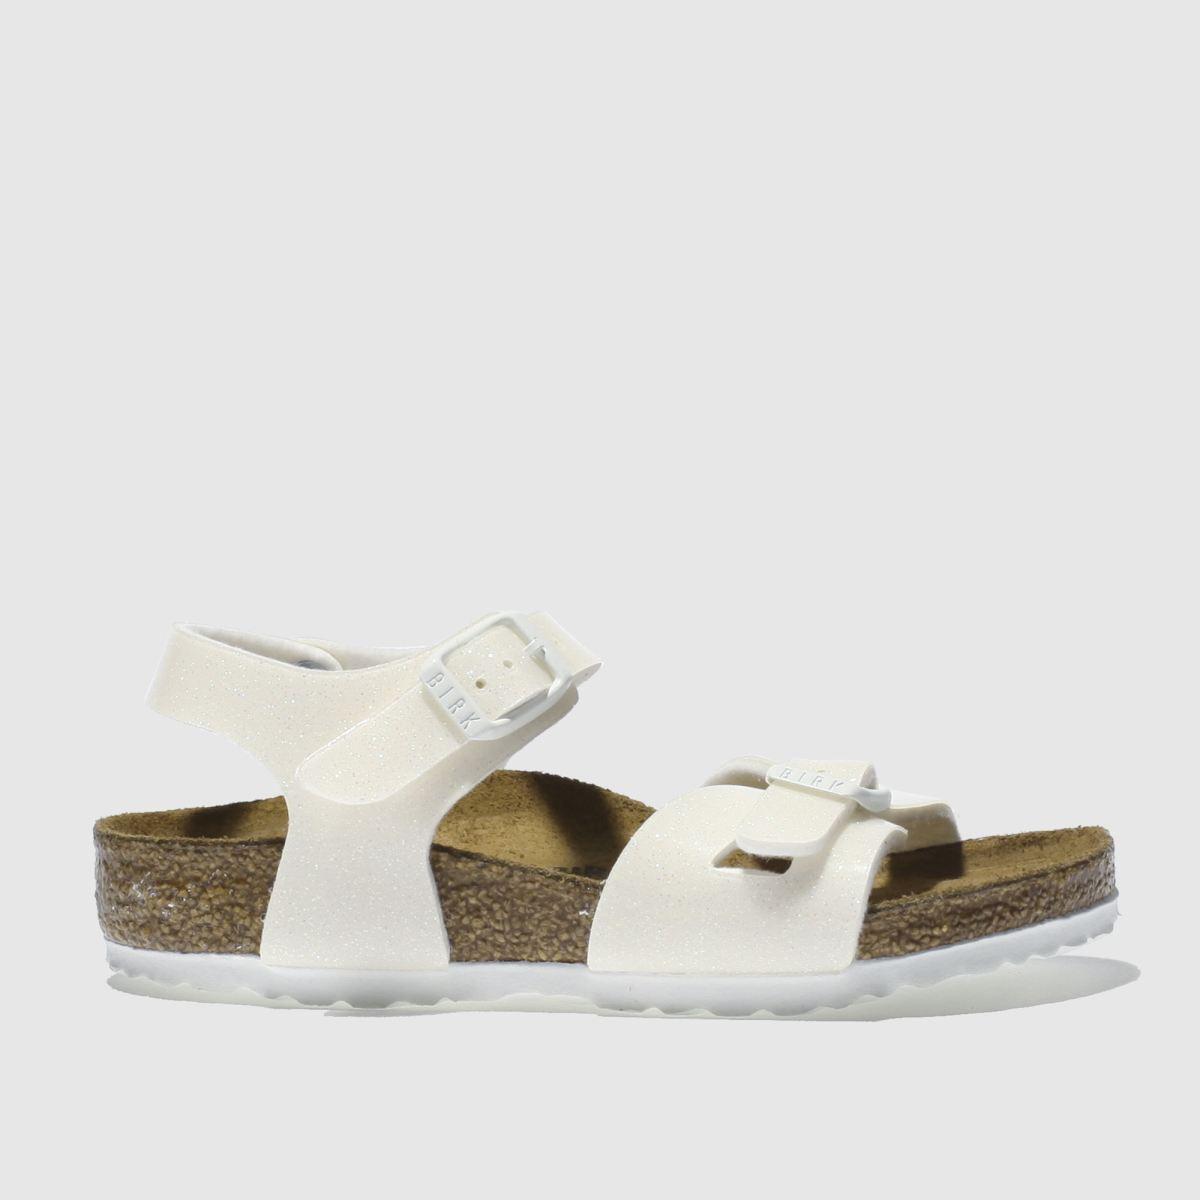 Birkenstock White Rio Sandals Toddler